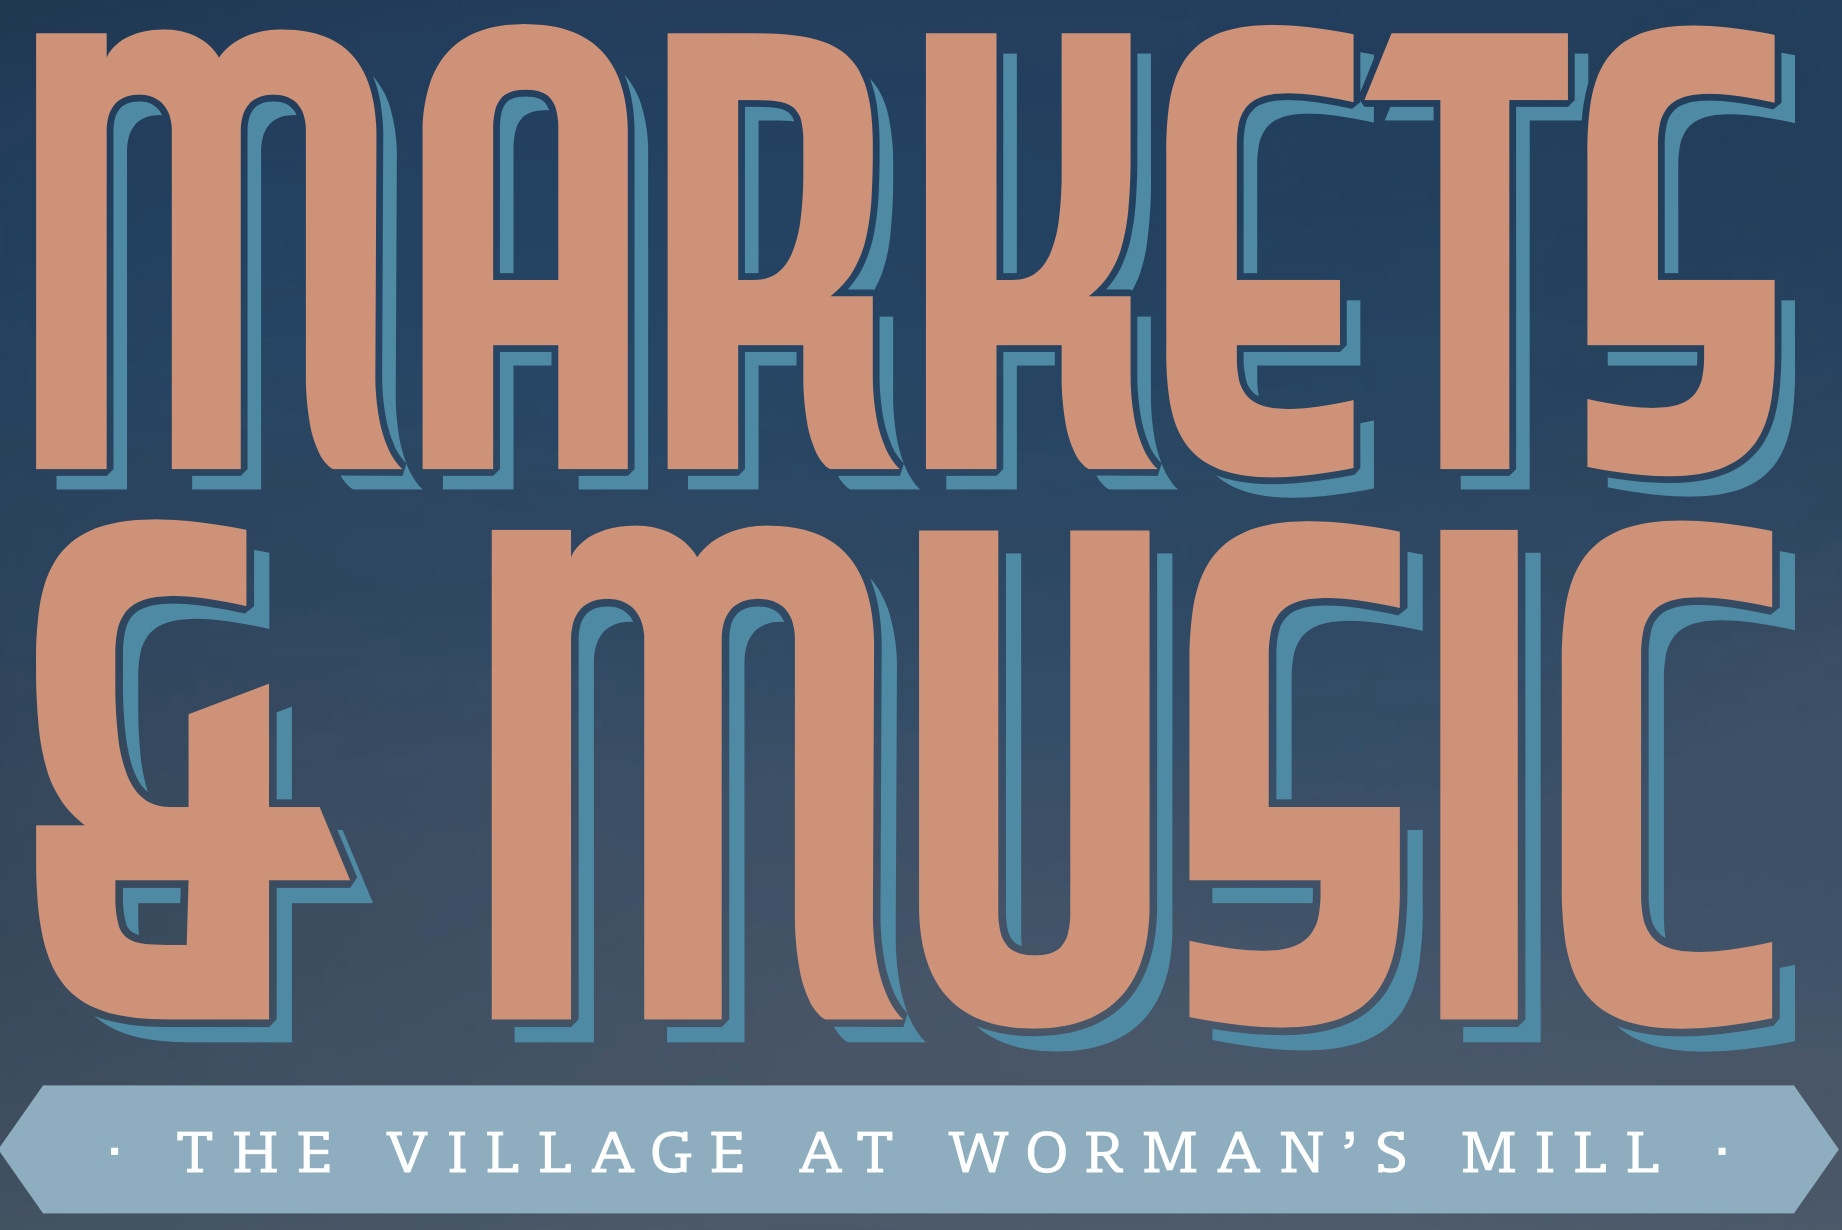 Worman's Mill Markets